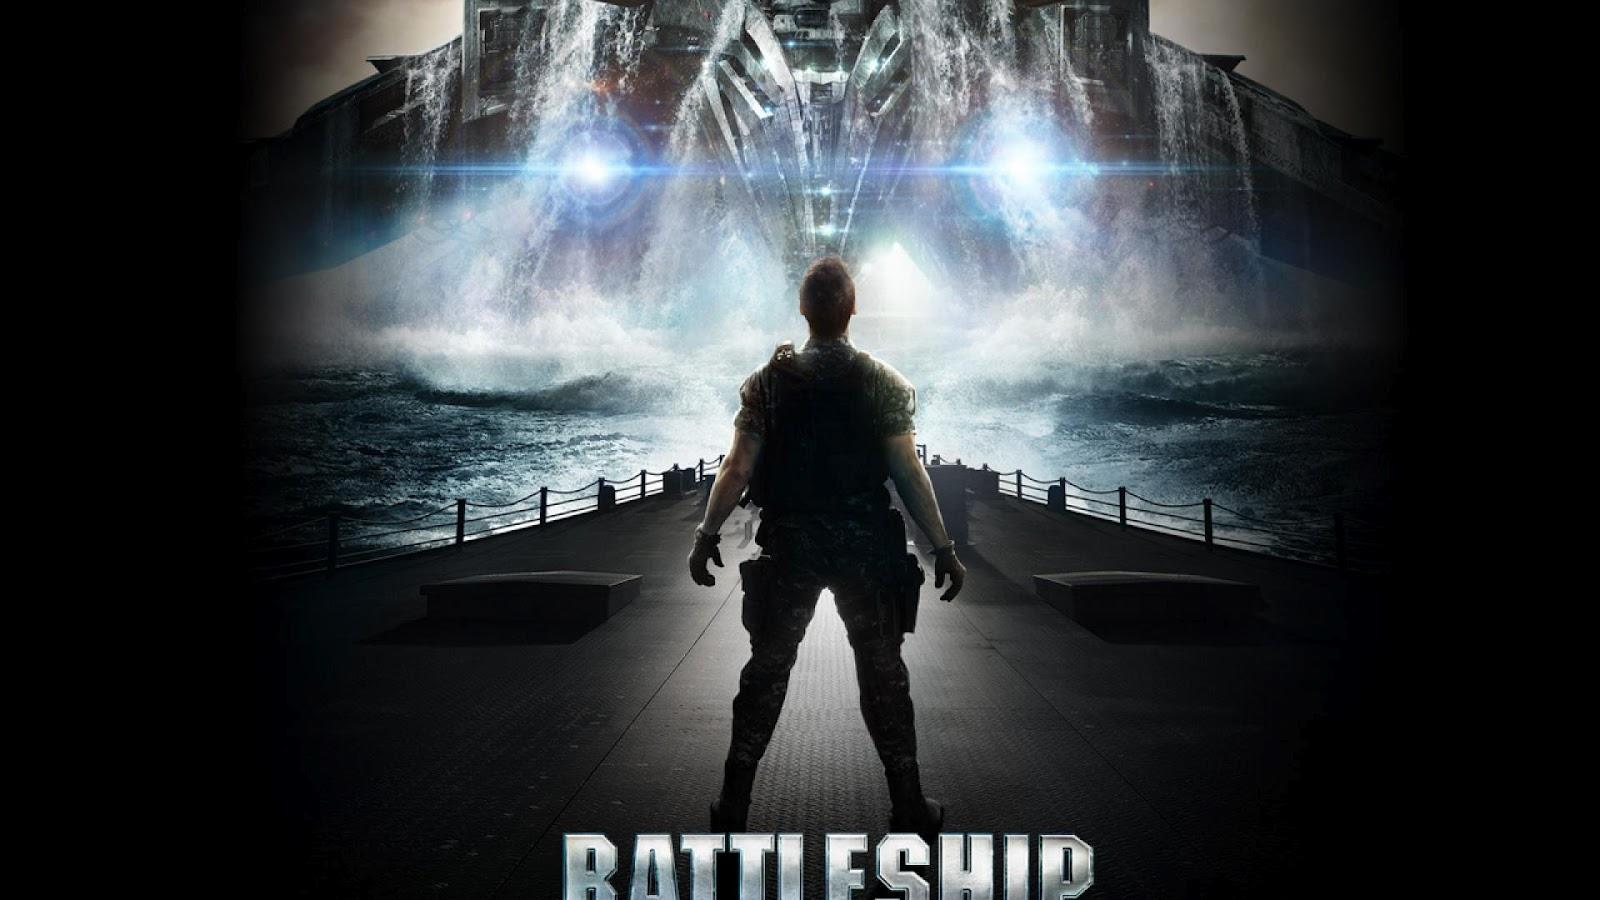 http://1.bp.blogspot.com/-BXzq1UXuuwY/UBHpgNY8oYI/AAAAAAAACe8/FxW5mzPIkBI/s1600/2012-battleship-movie-wallpaper-1080x1920.jpg